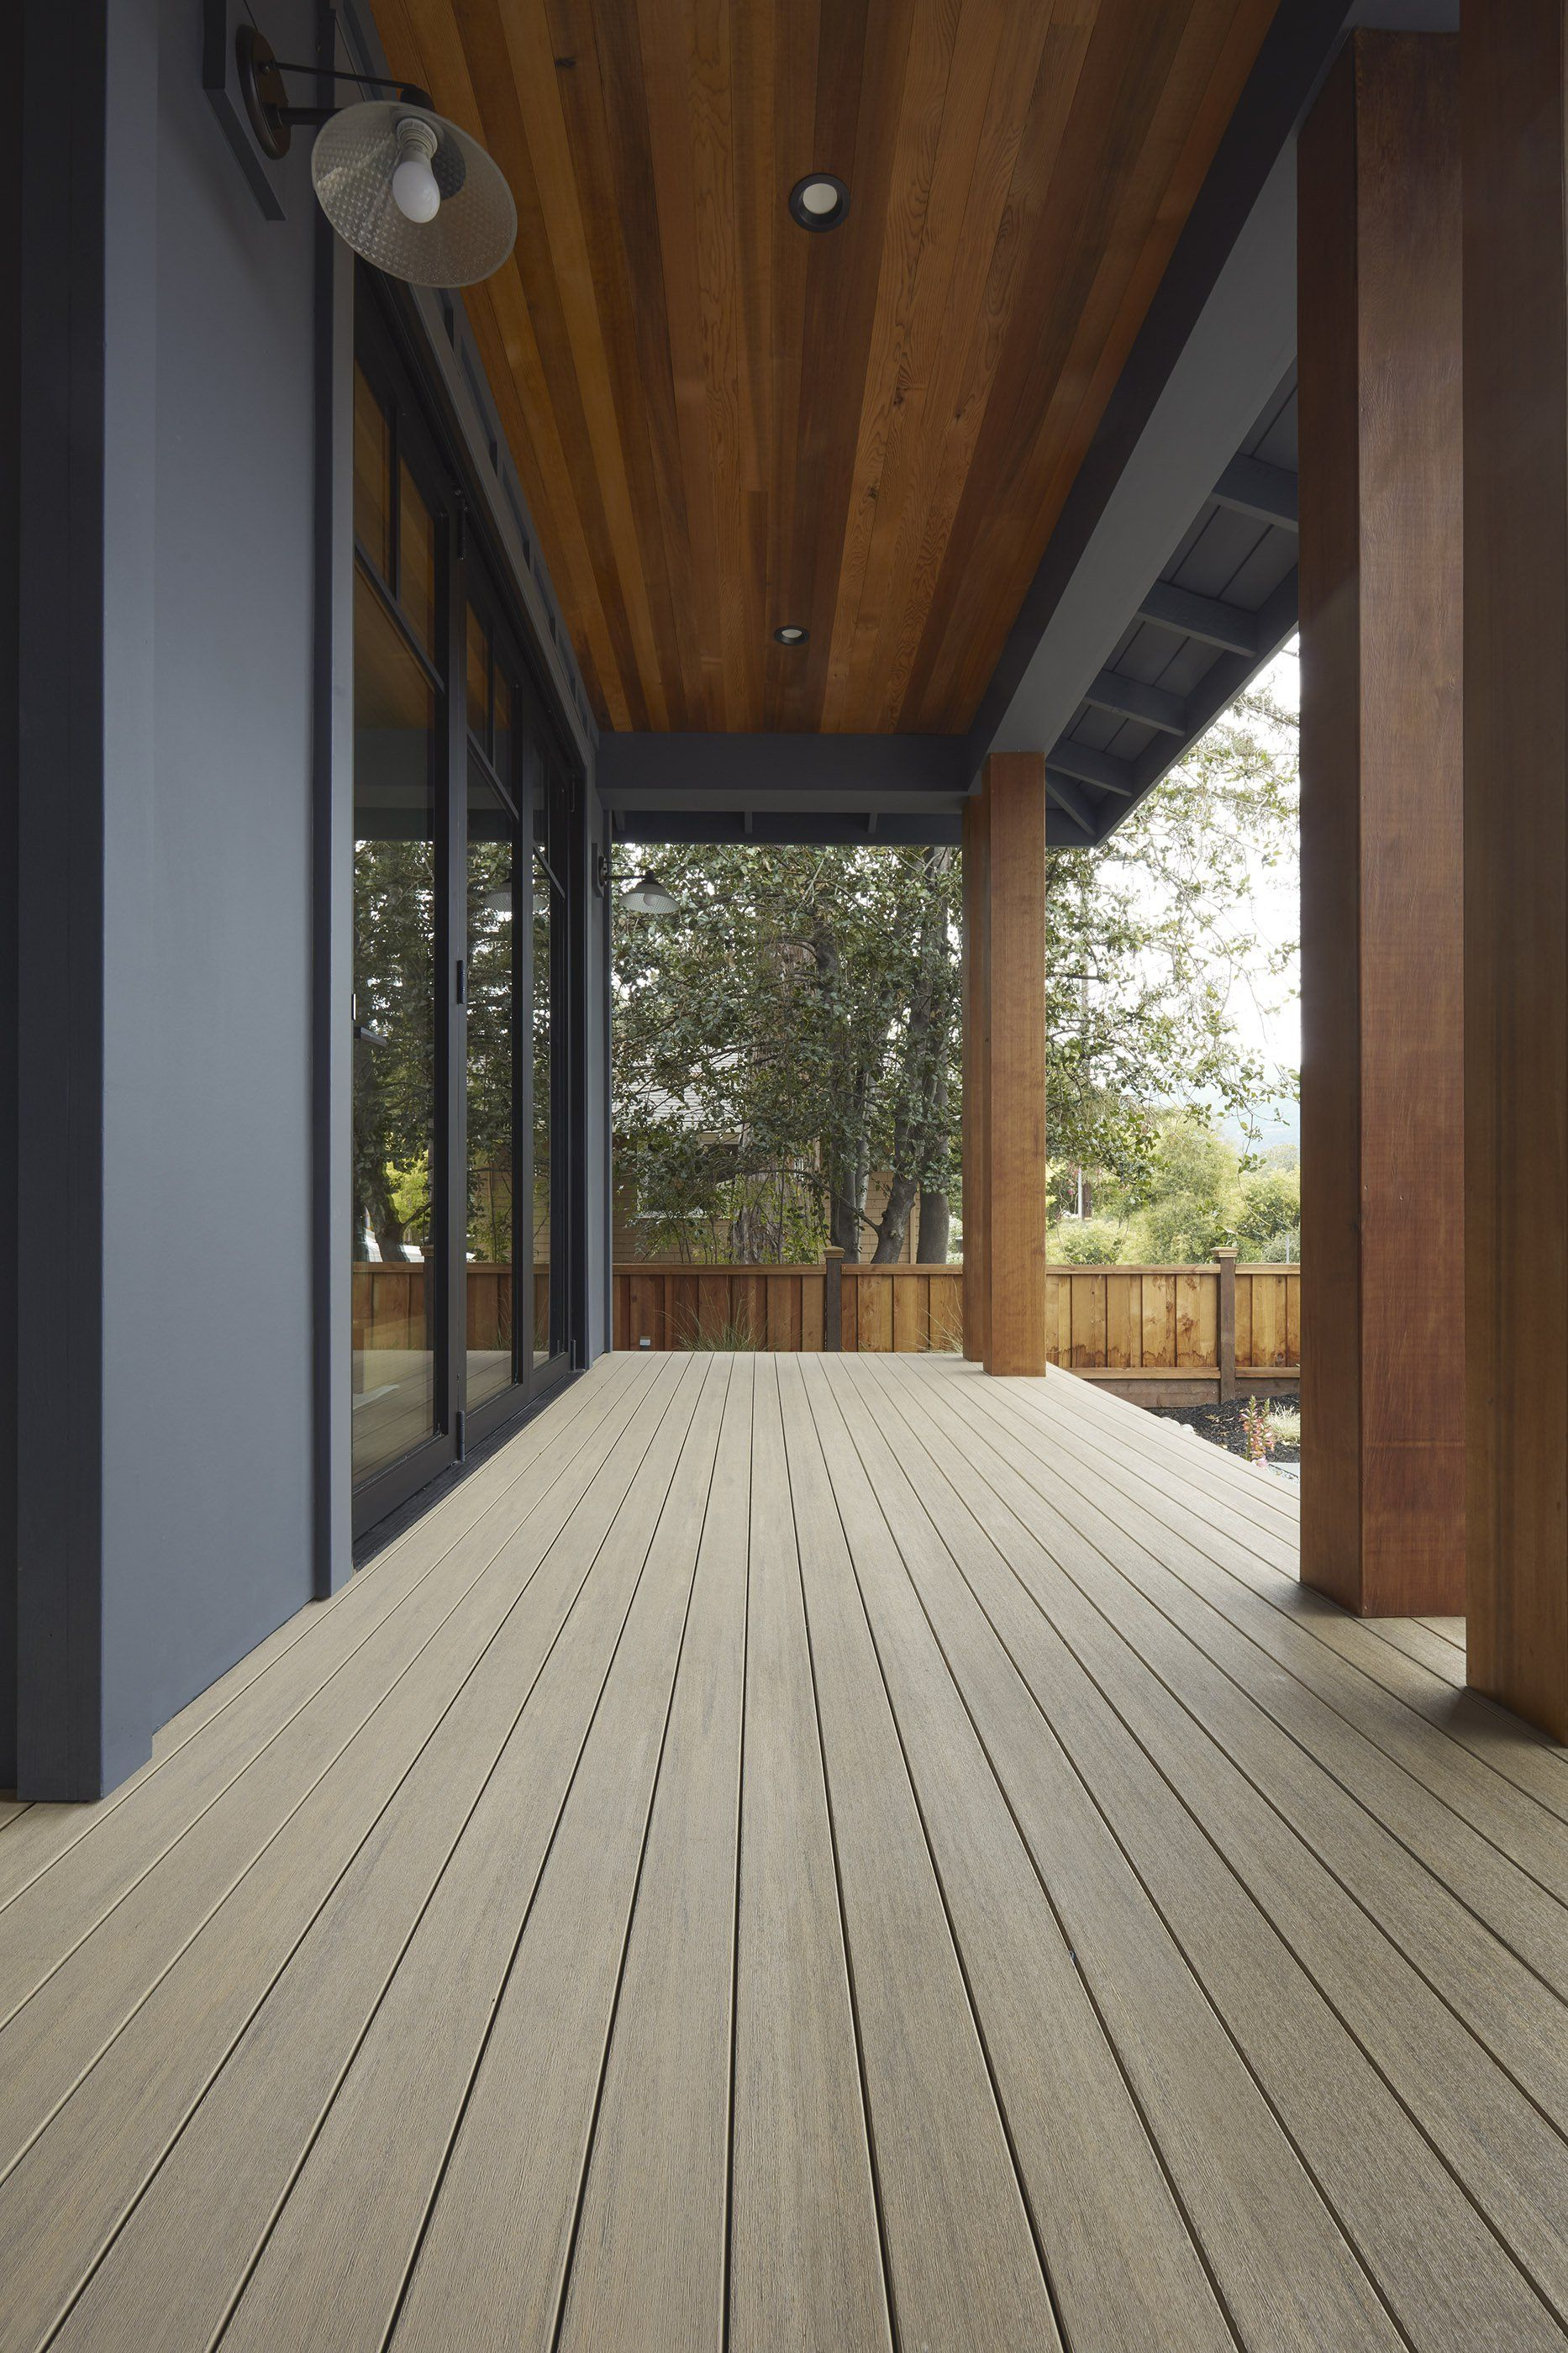 MultiWidth Composite Decking TimberTech Composite decking